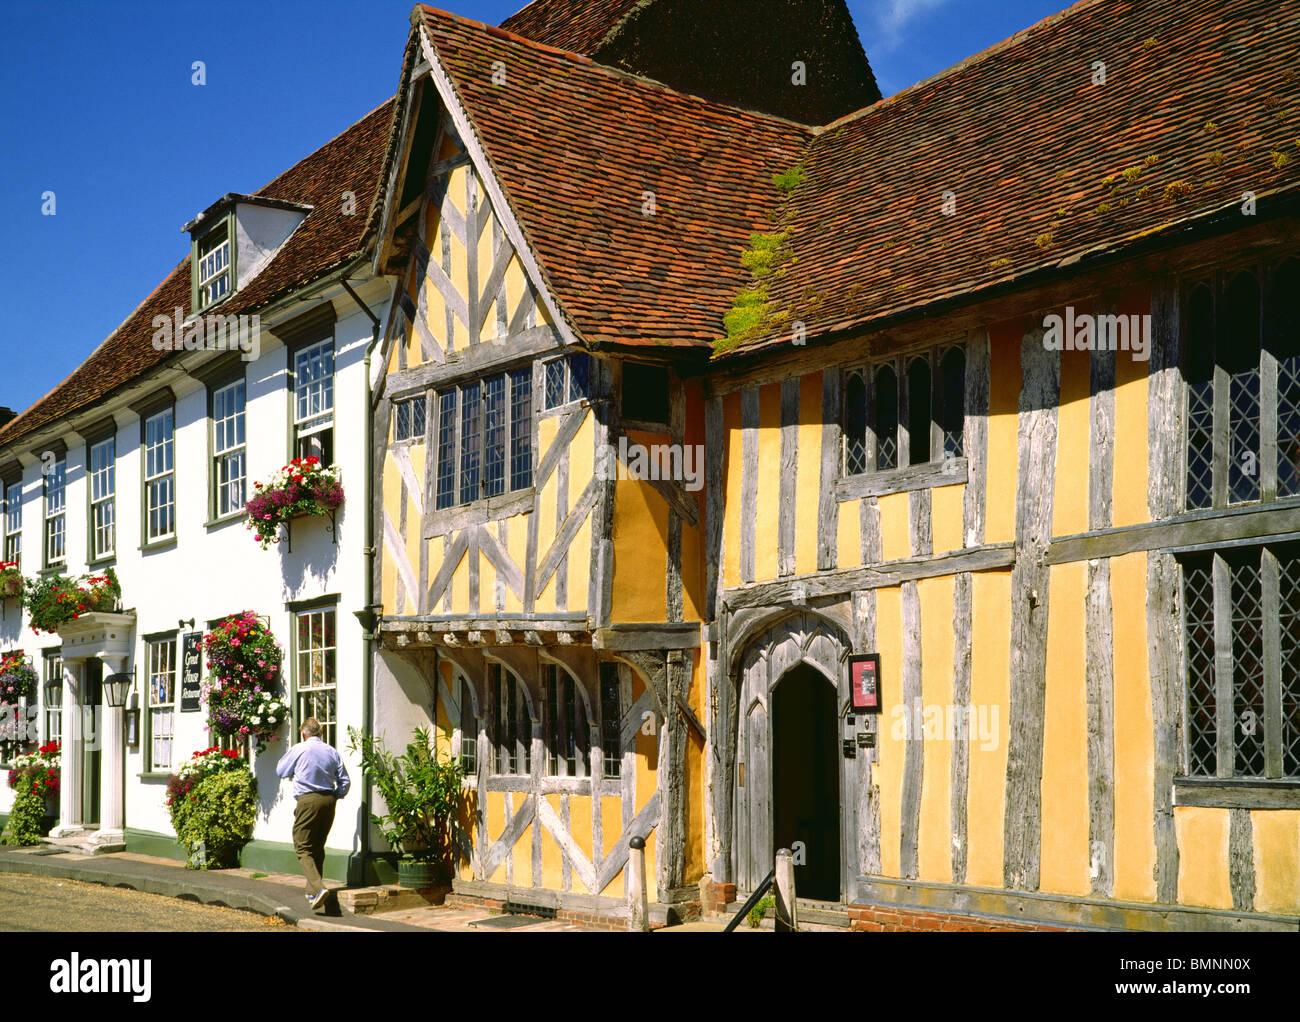 Suffolk, Lavenham, Little Guildhall - Stock Image